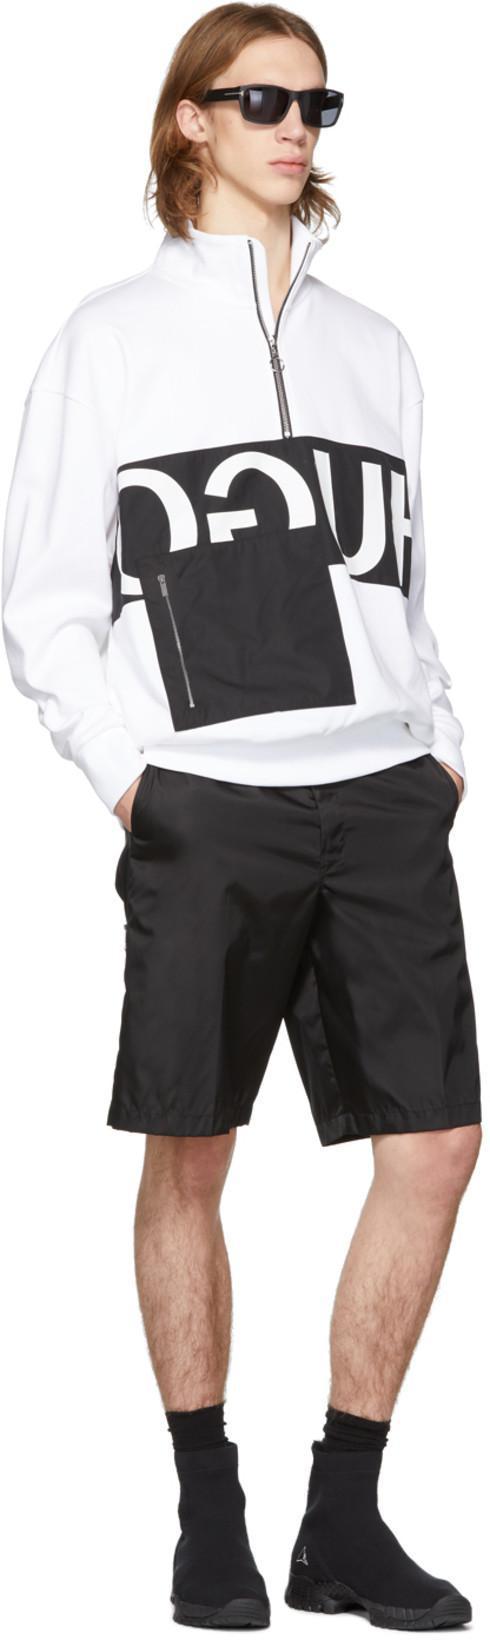 6d593d0e TOM FORD Tom Ford Black Mason Sunglasses in 02D Blk/Smo. Hugo White Reverse  Logo Patch Pocket Zip-Up Sweatshirt In 100 White